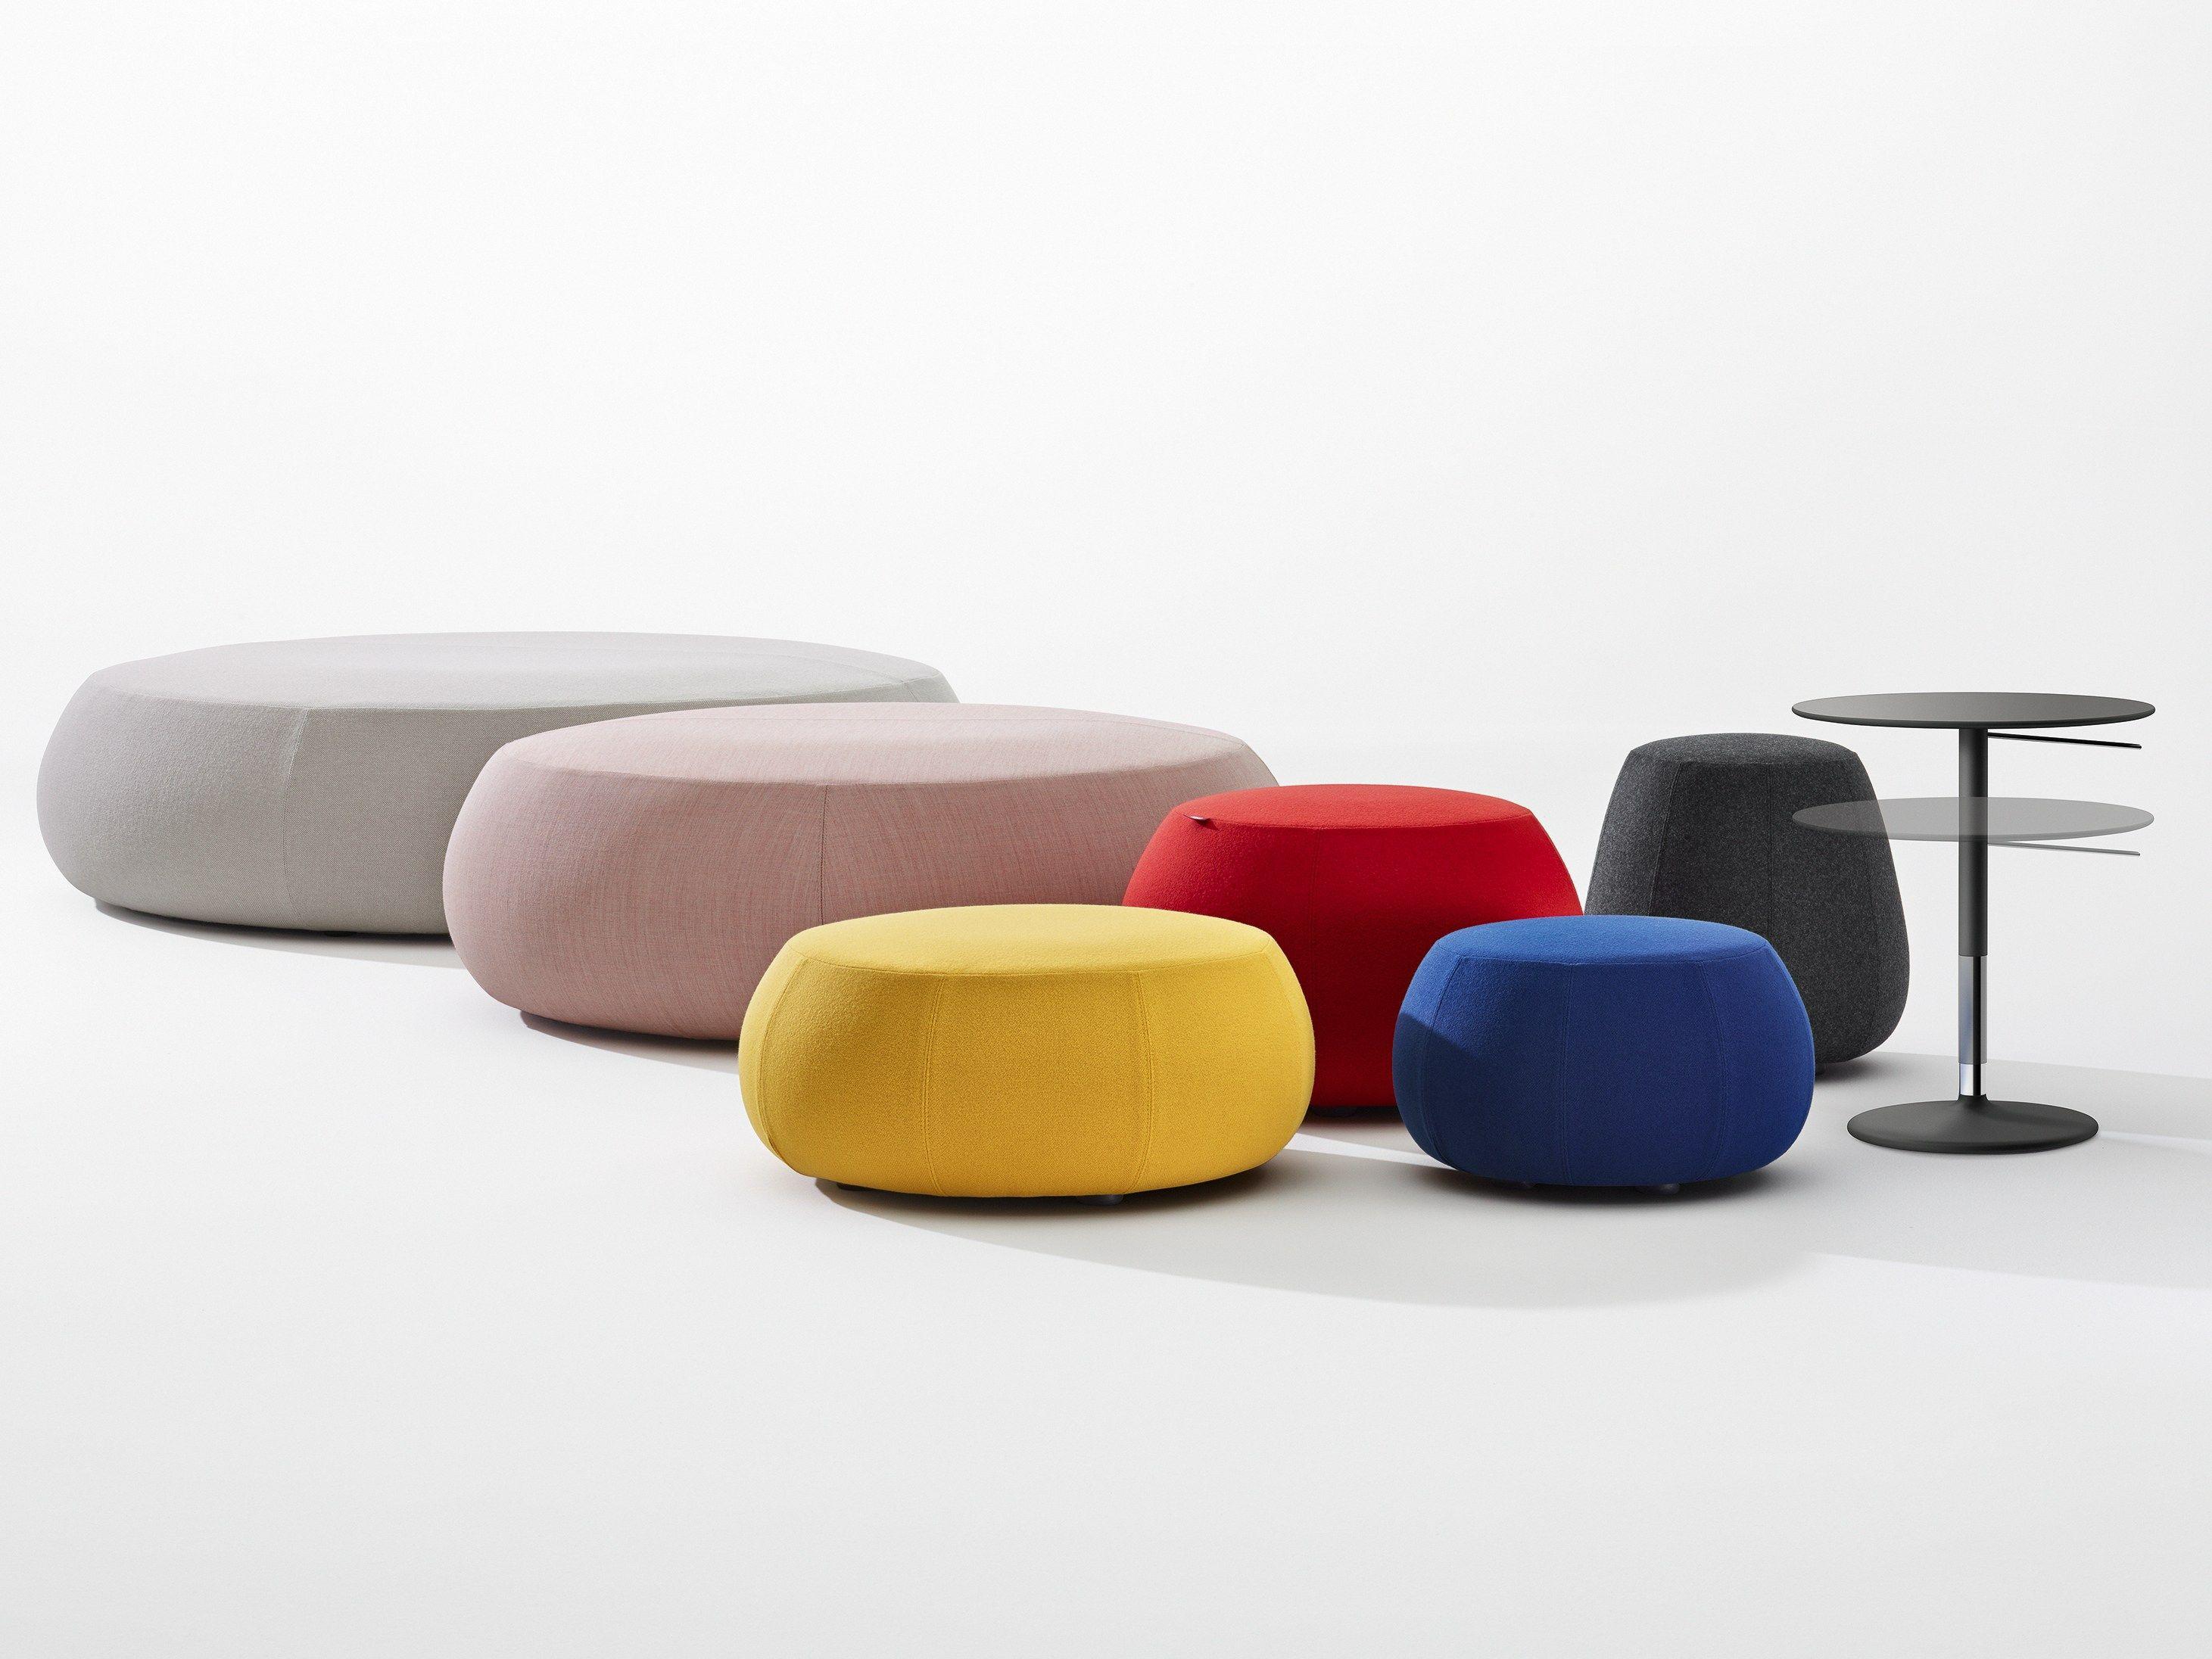 upholstered pouf pix mini by arper design ichiro iwasaki. Black Bedroom Furniture Sets. Home Design Ideas